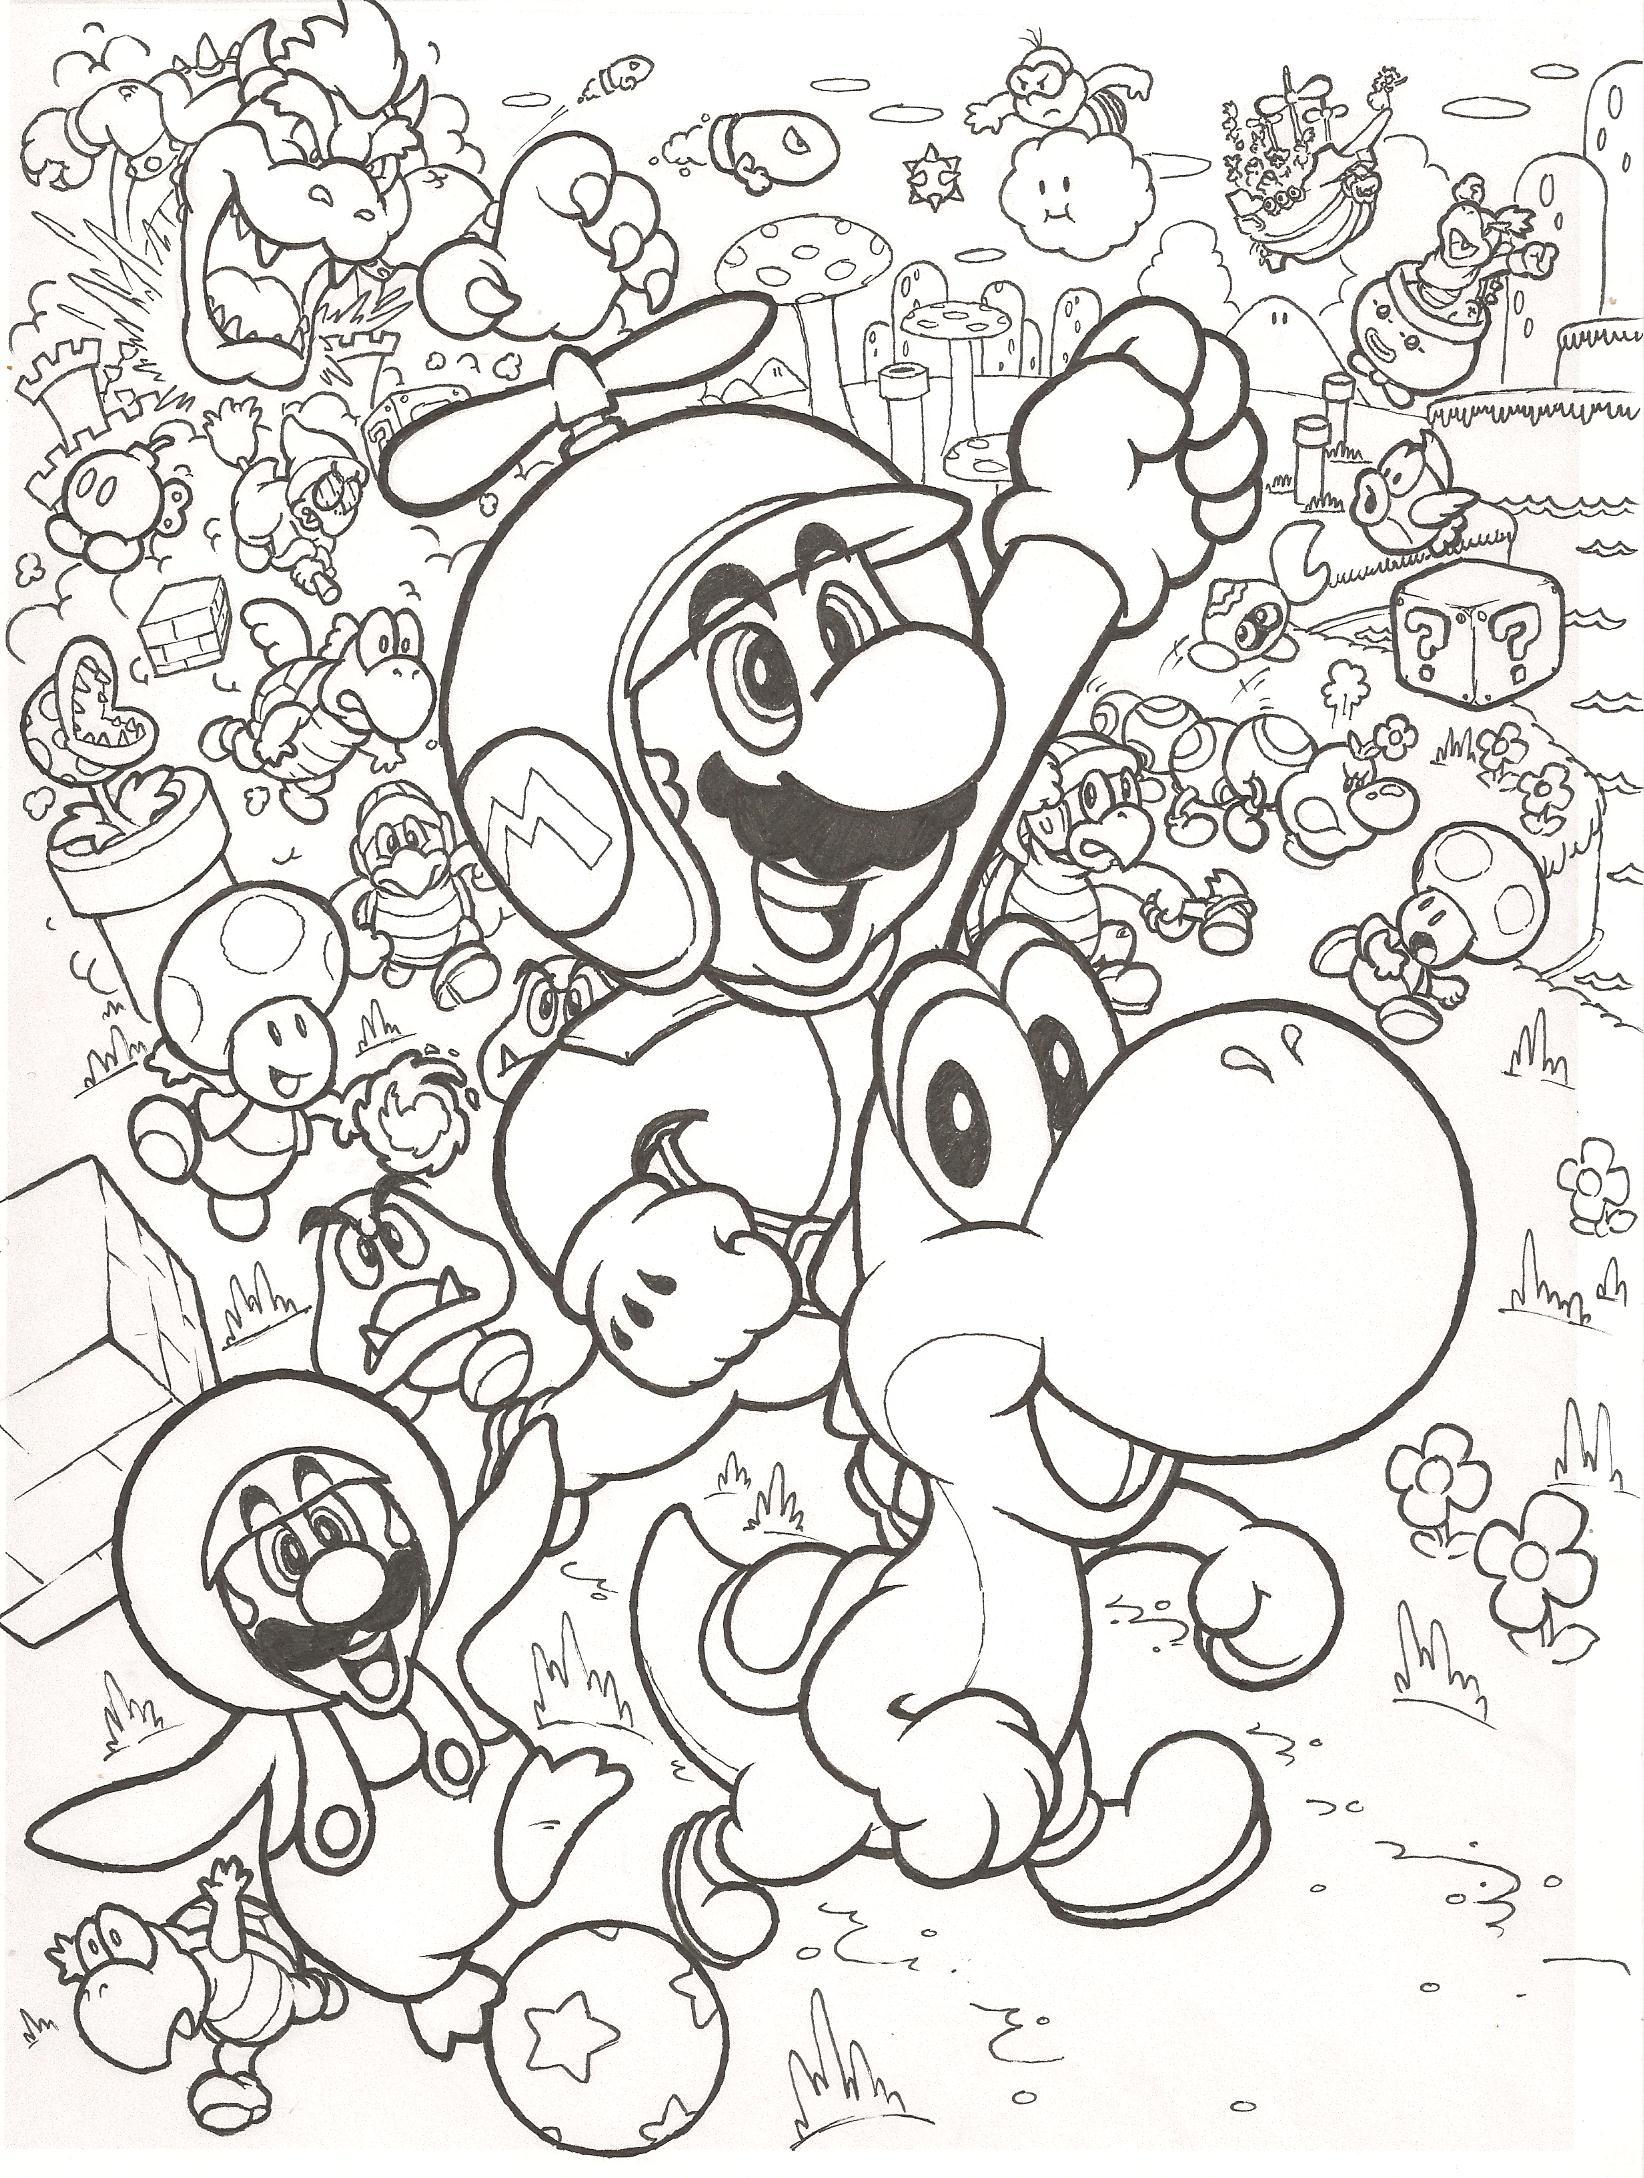 Artwork do dia: New Super Mario Bros. Wii retro-style